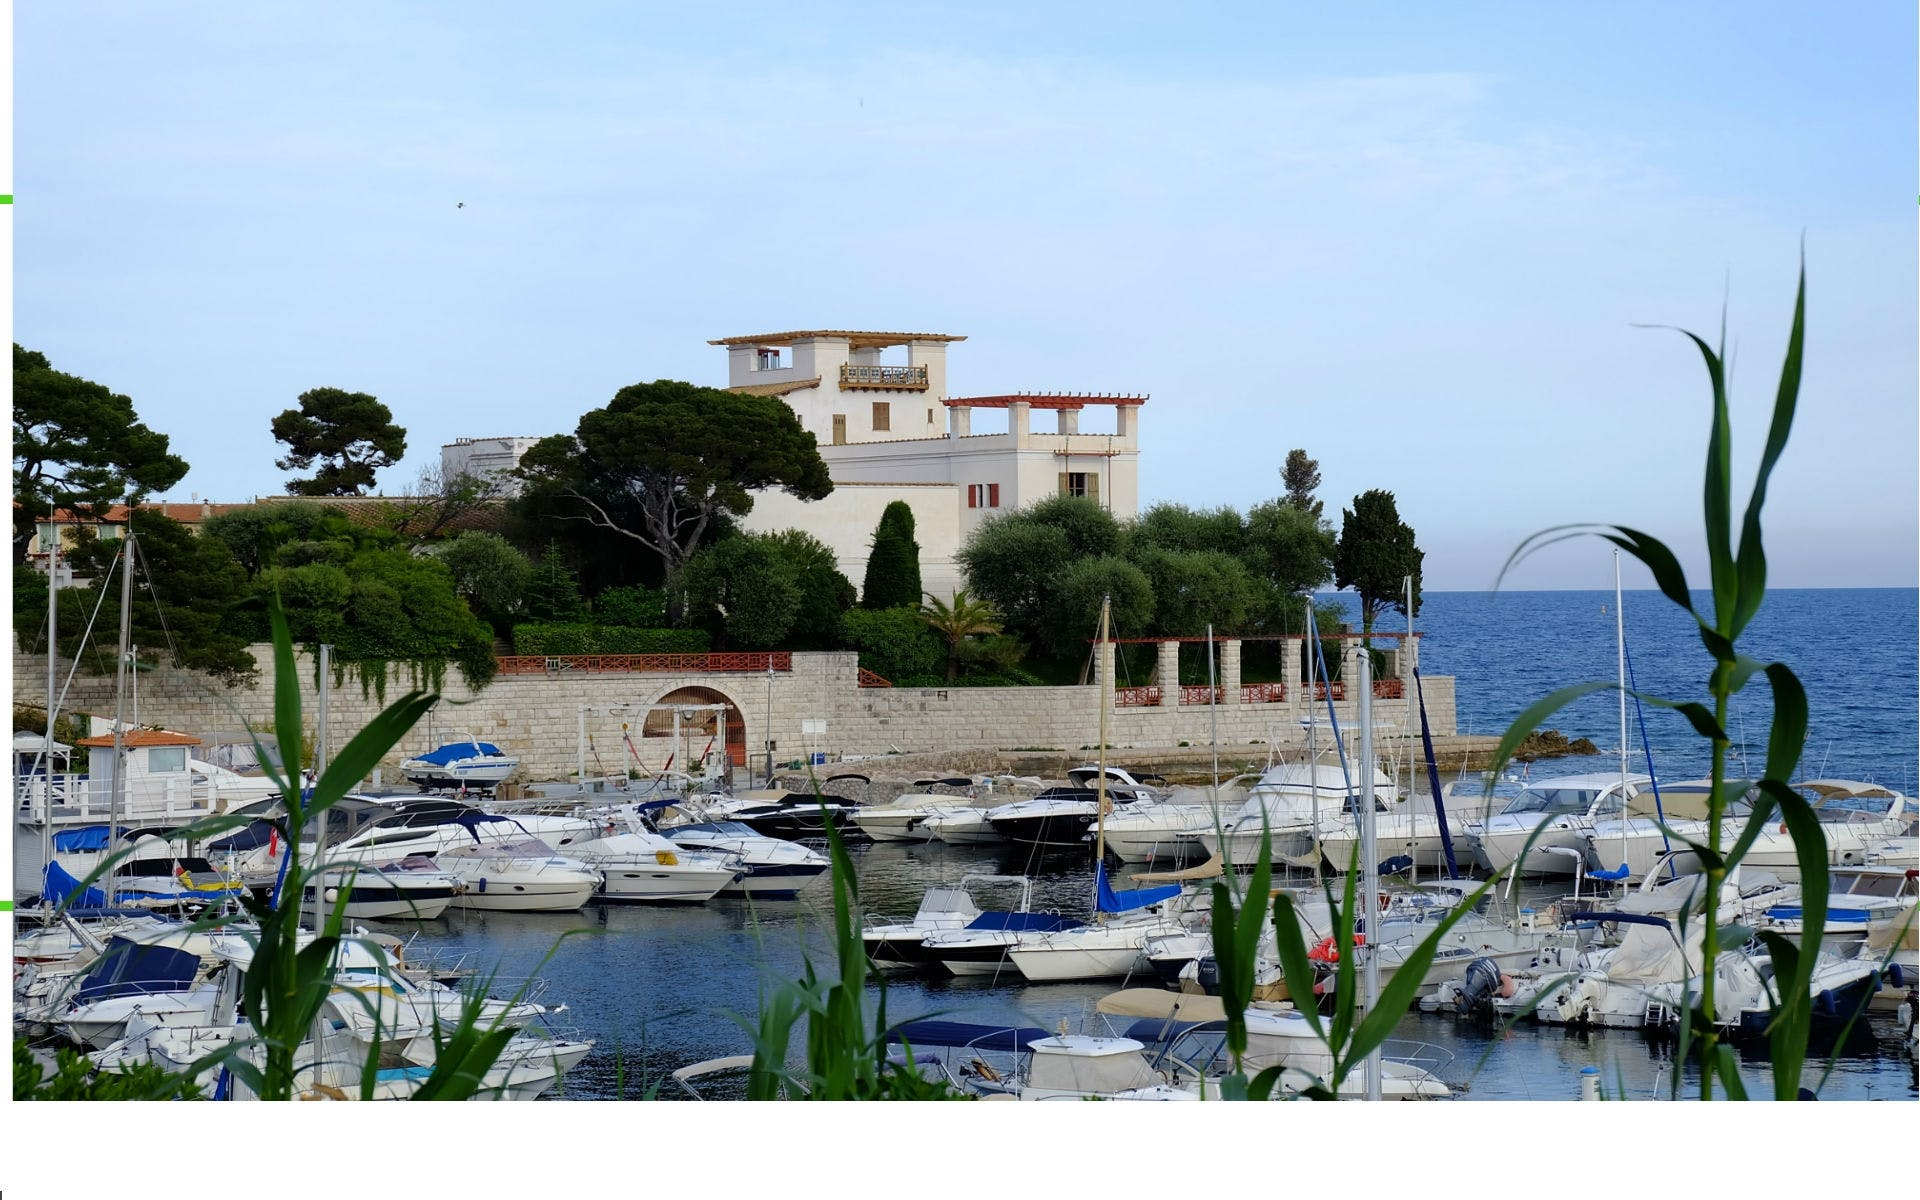 Entrance tickets to Villa Kerylos